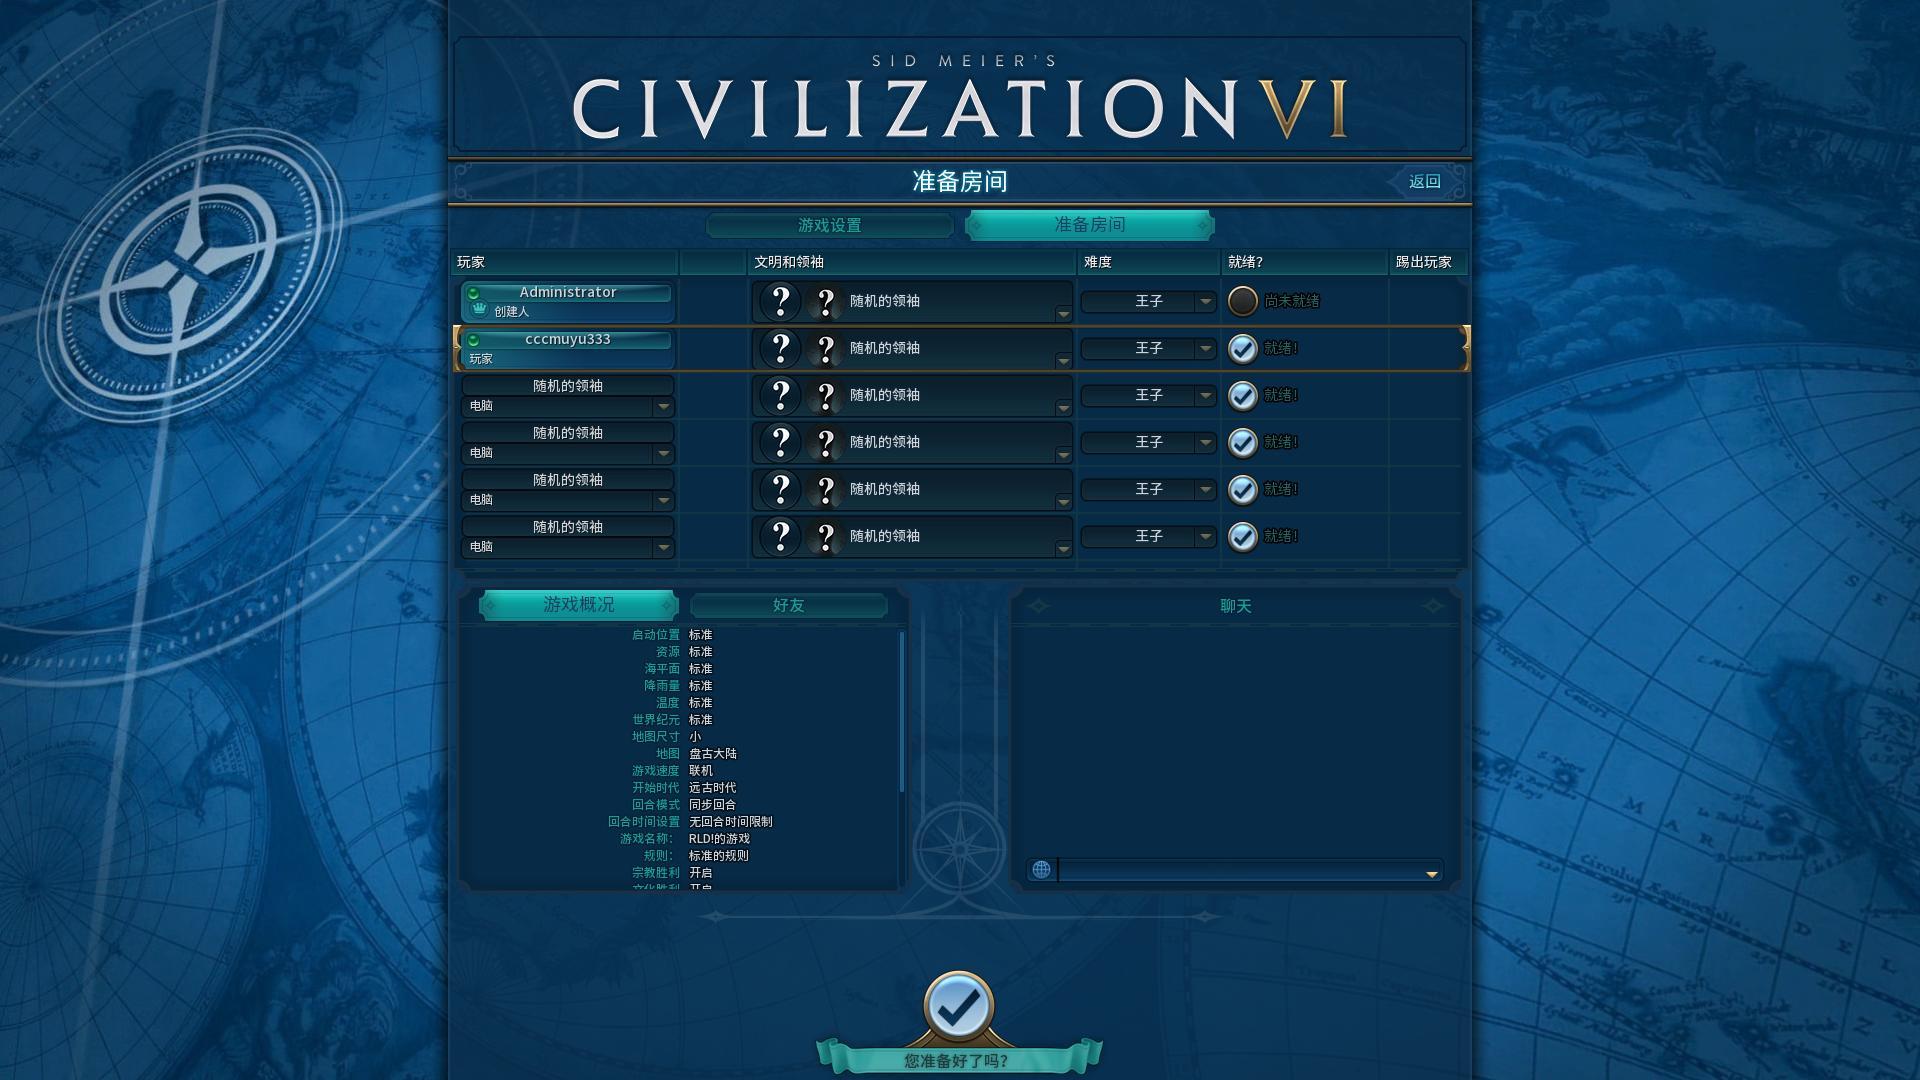 CivilizationVI 2016-10-21 15-10-39-51.jpg